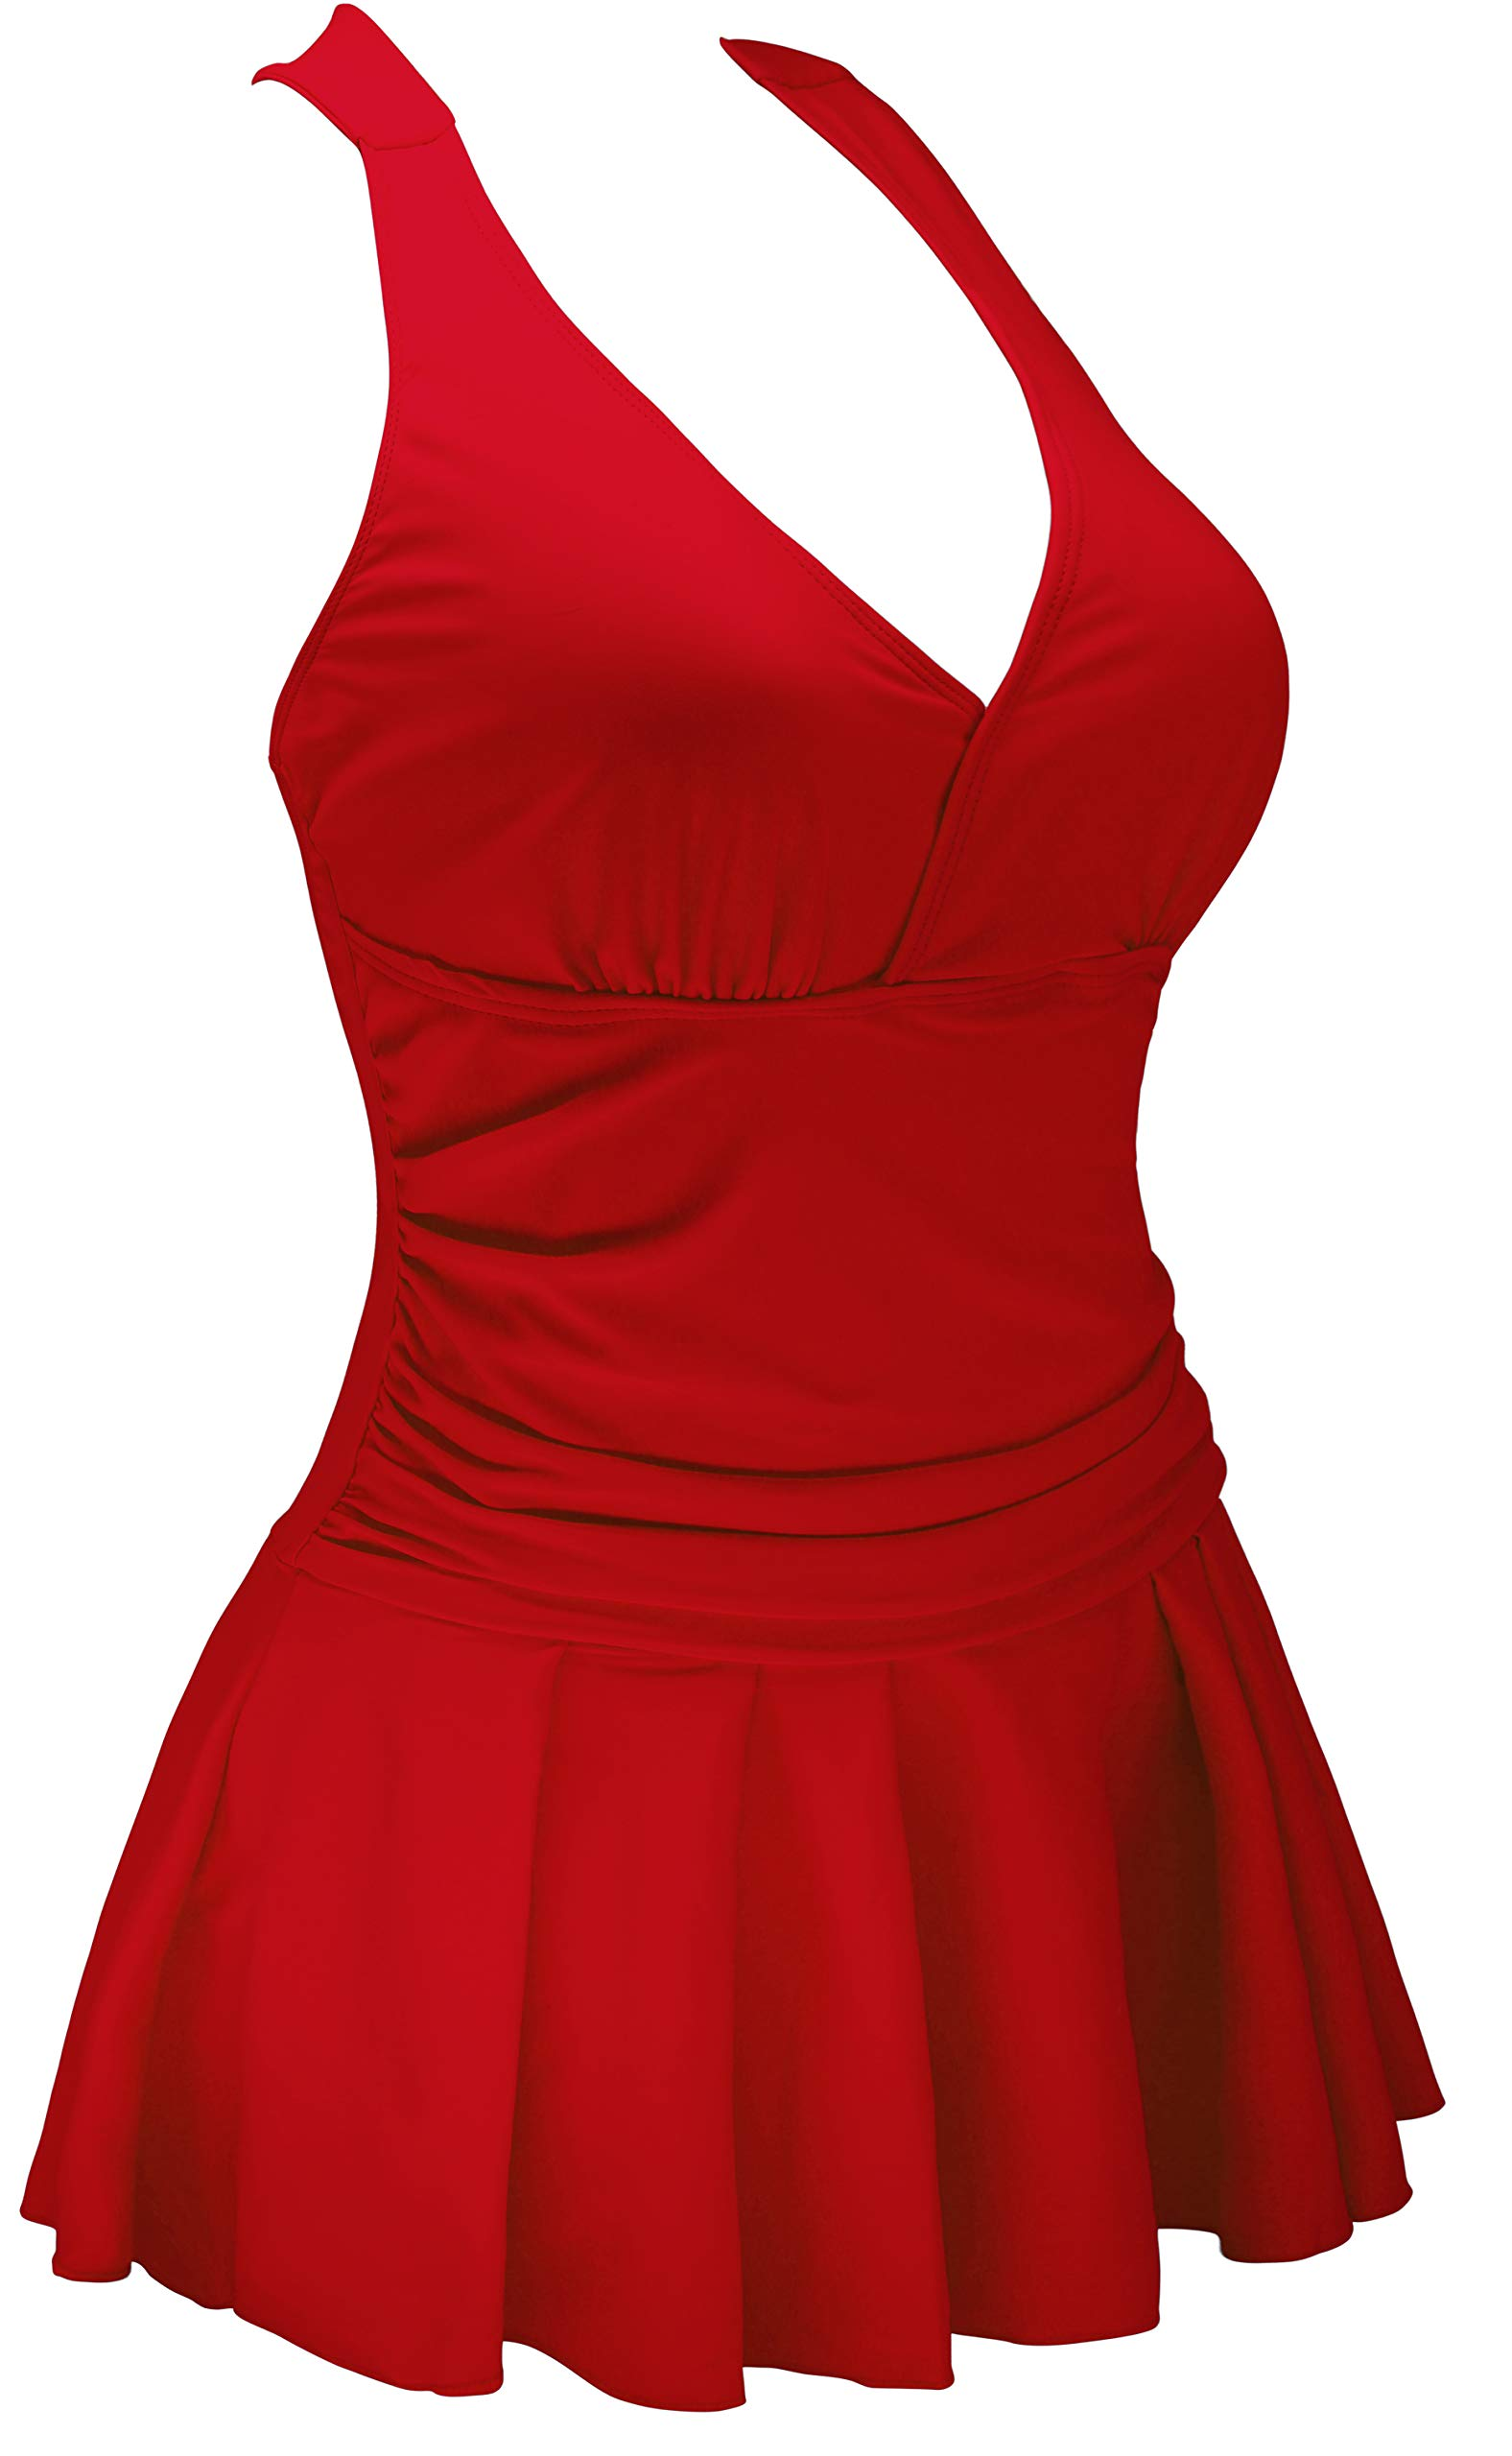 AONTUS High Waisted Swimwear Bottoms Leggings Shorts Tops (Red,3XL)